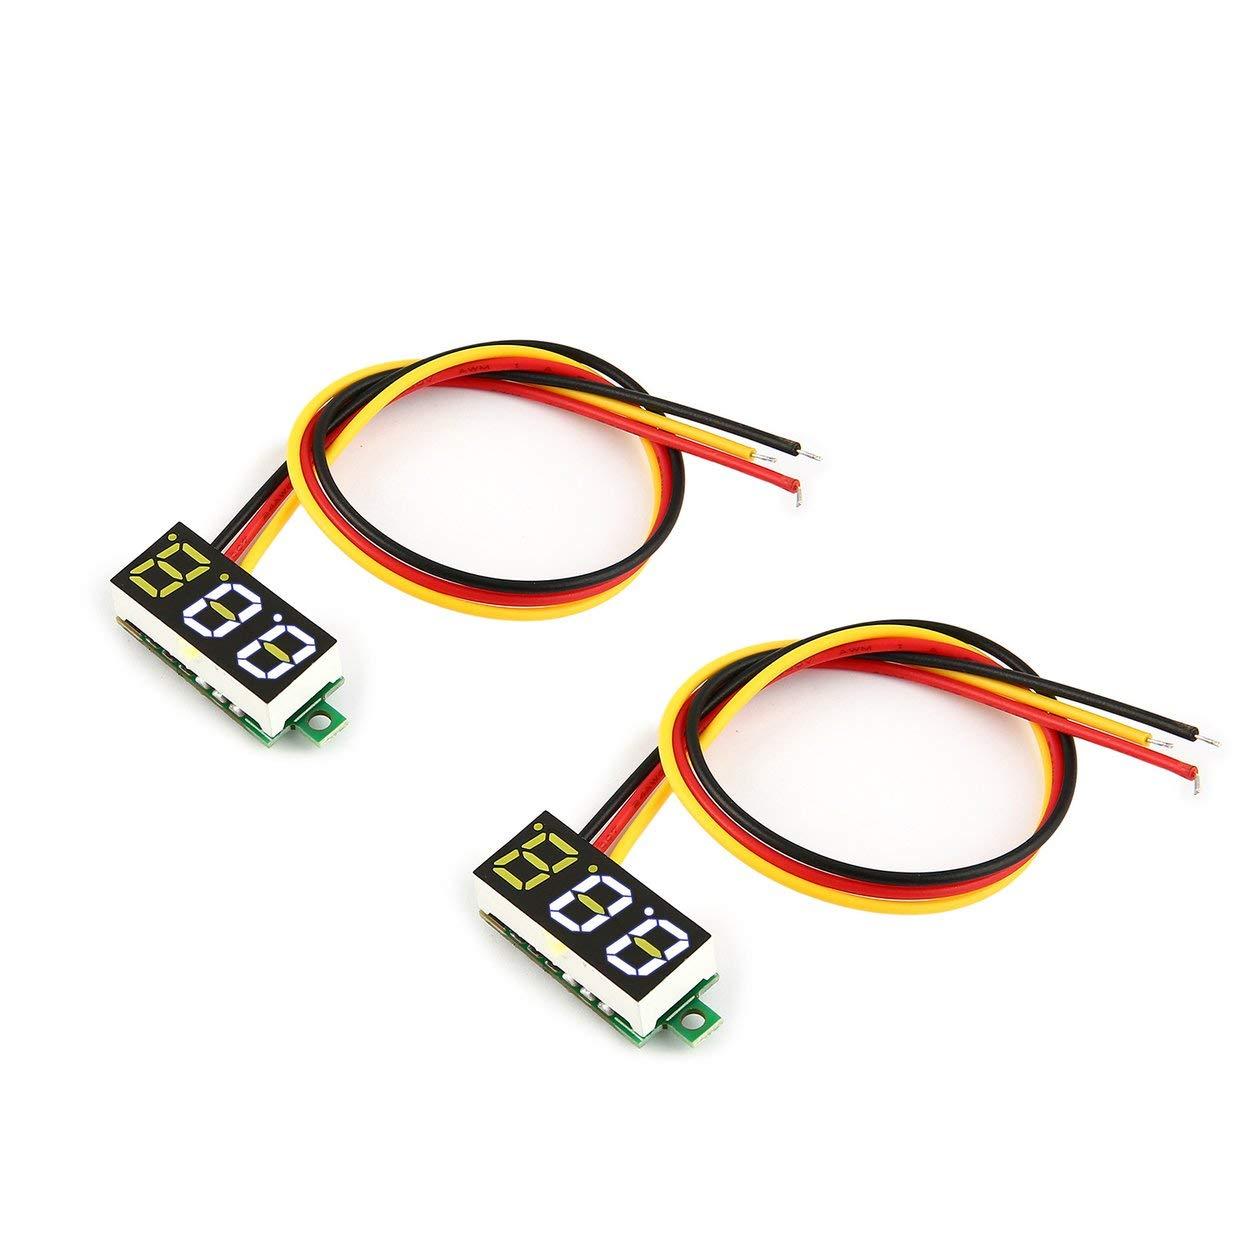 Lorenlli 2PCS 100V 0.28in 3 Wire LED Digital Display Panel Voltmeter Electric Voltage Meter Volt Tester for Auto Battery Car Motorcycle